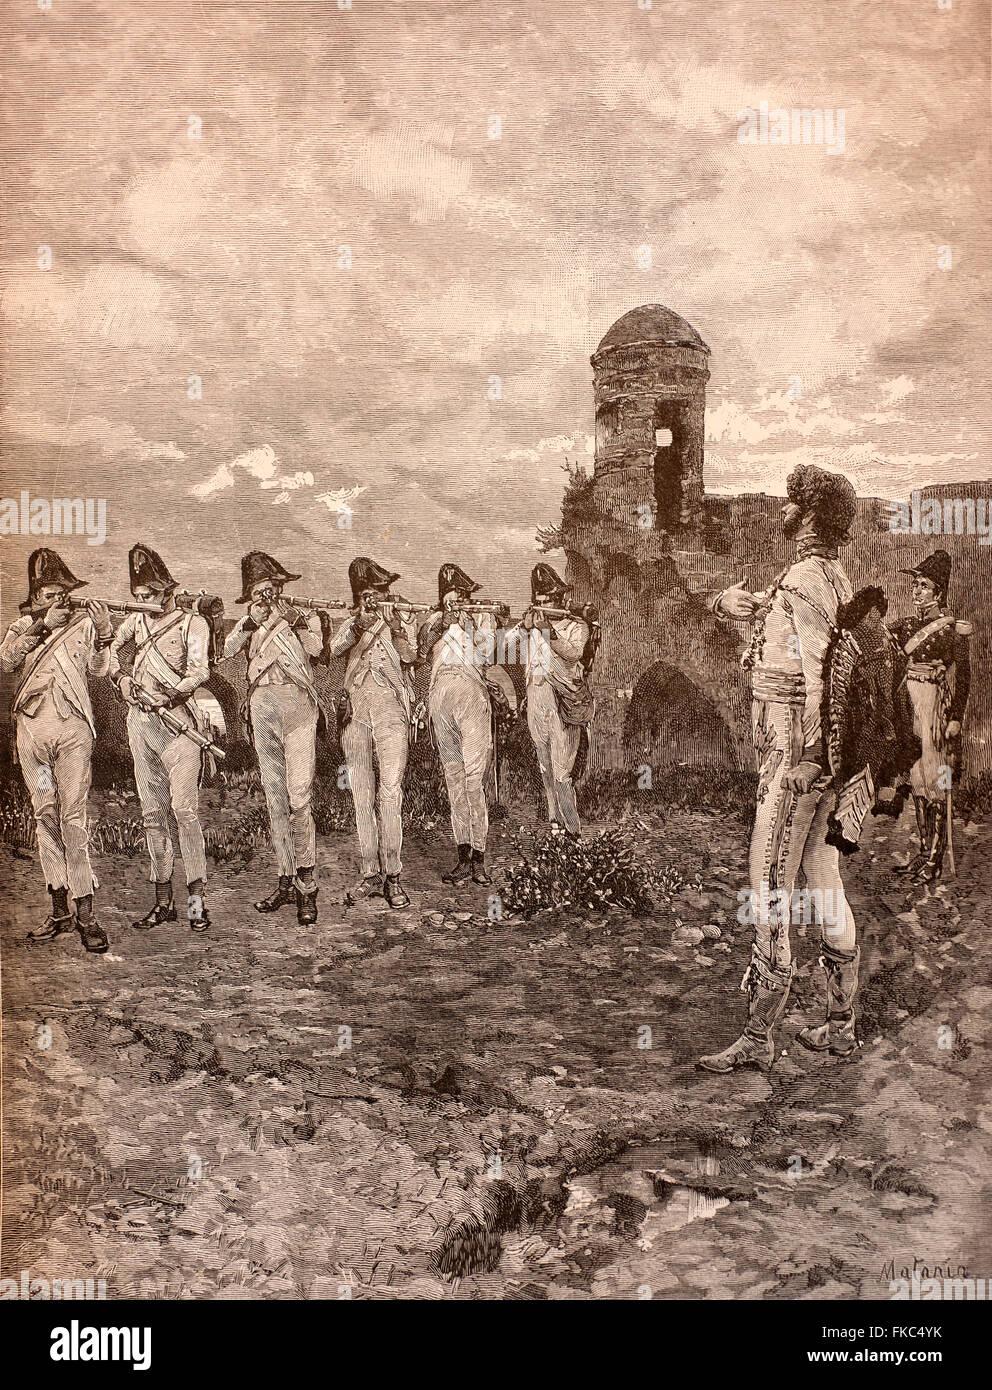 Italian Risorgimento October 13, 1815 -shooting of Gioacchino Murat - Stock Image